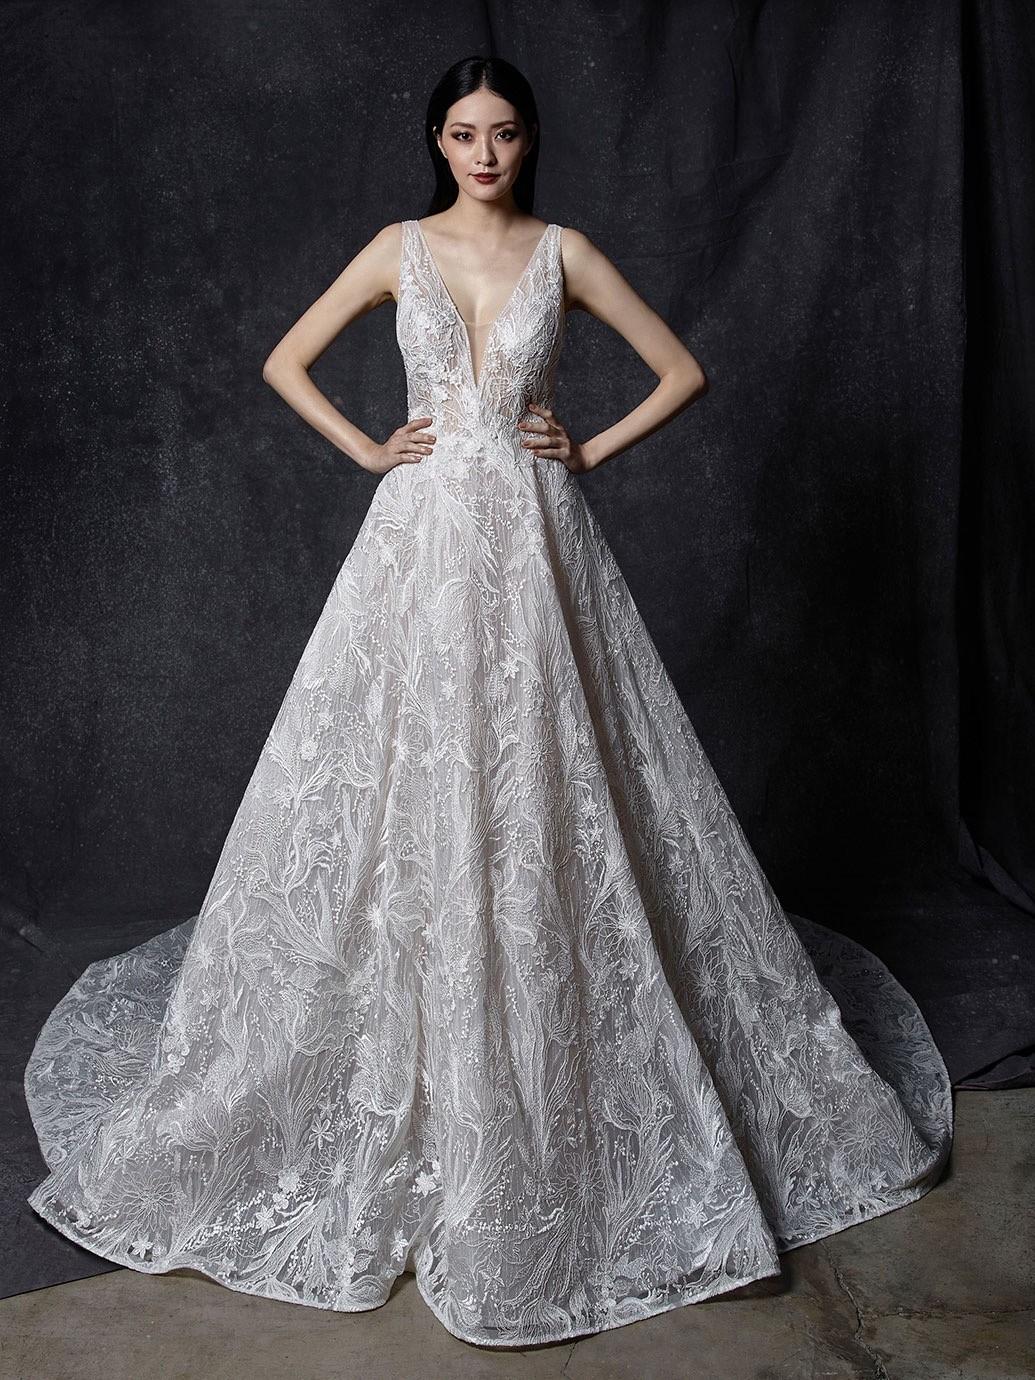 Brautkleid Modell Oksana aus der Enzoani Kollektion 2020